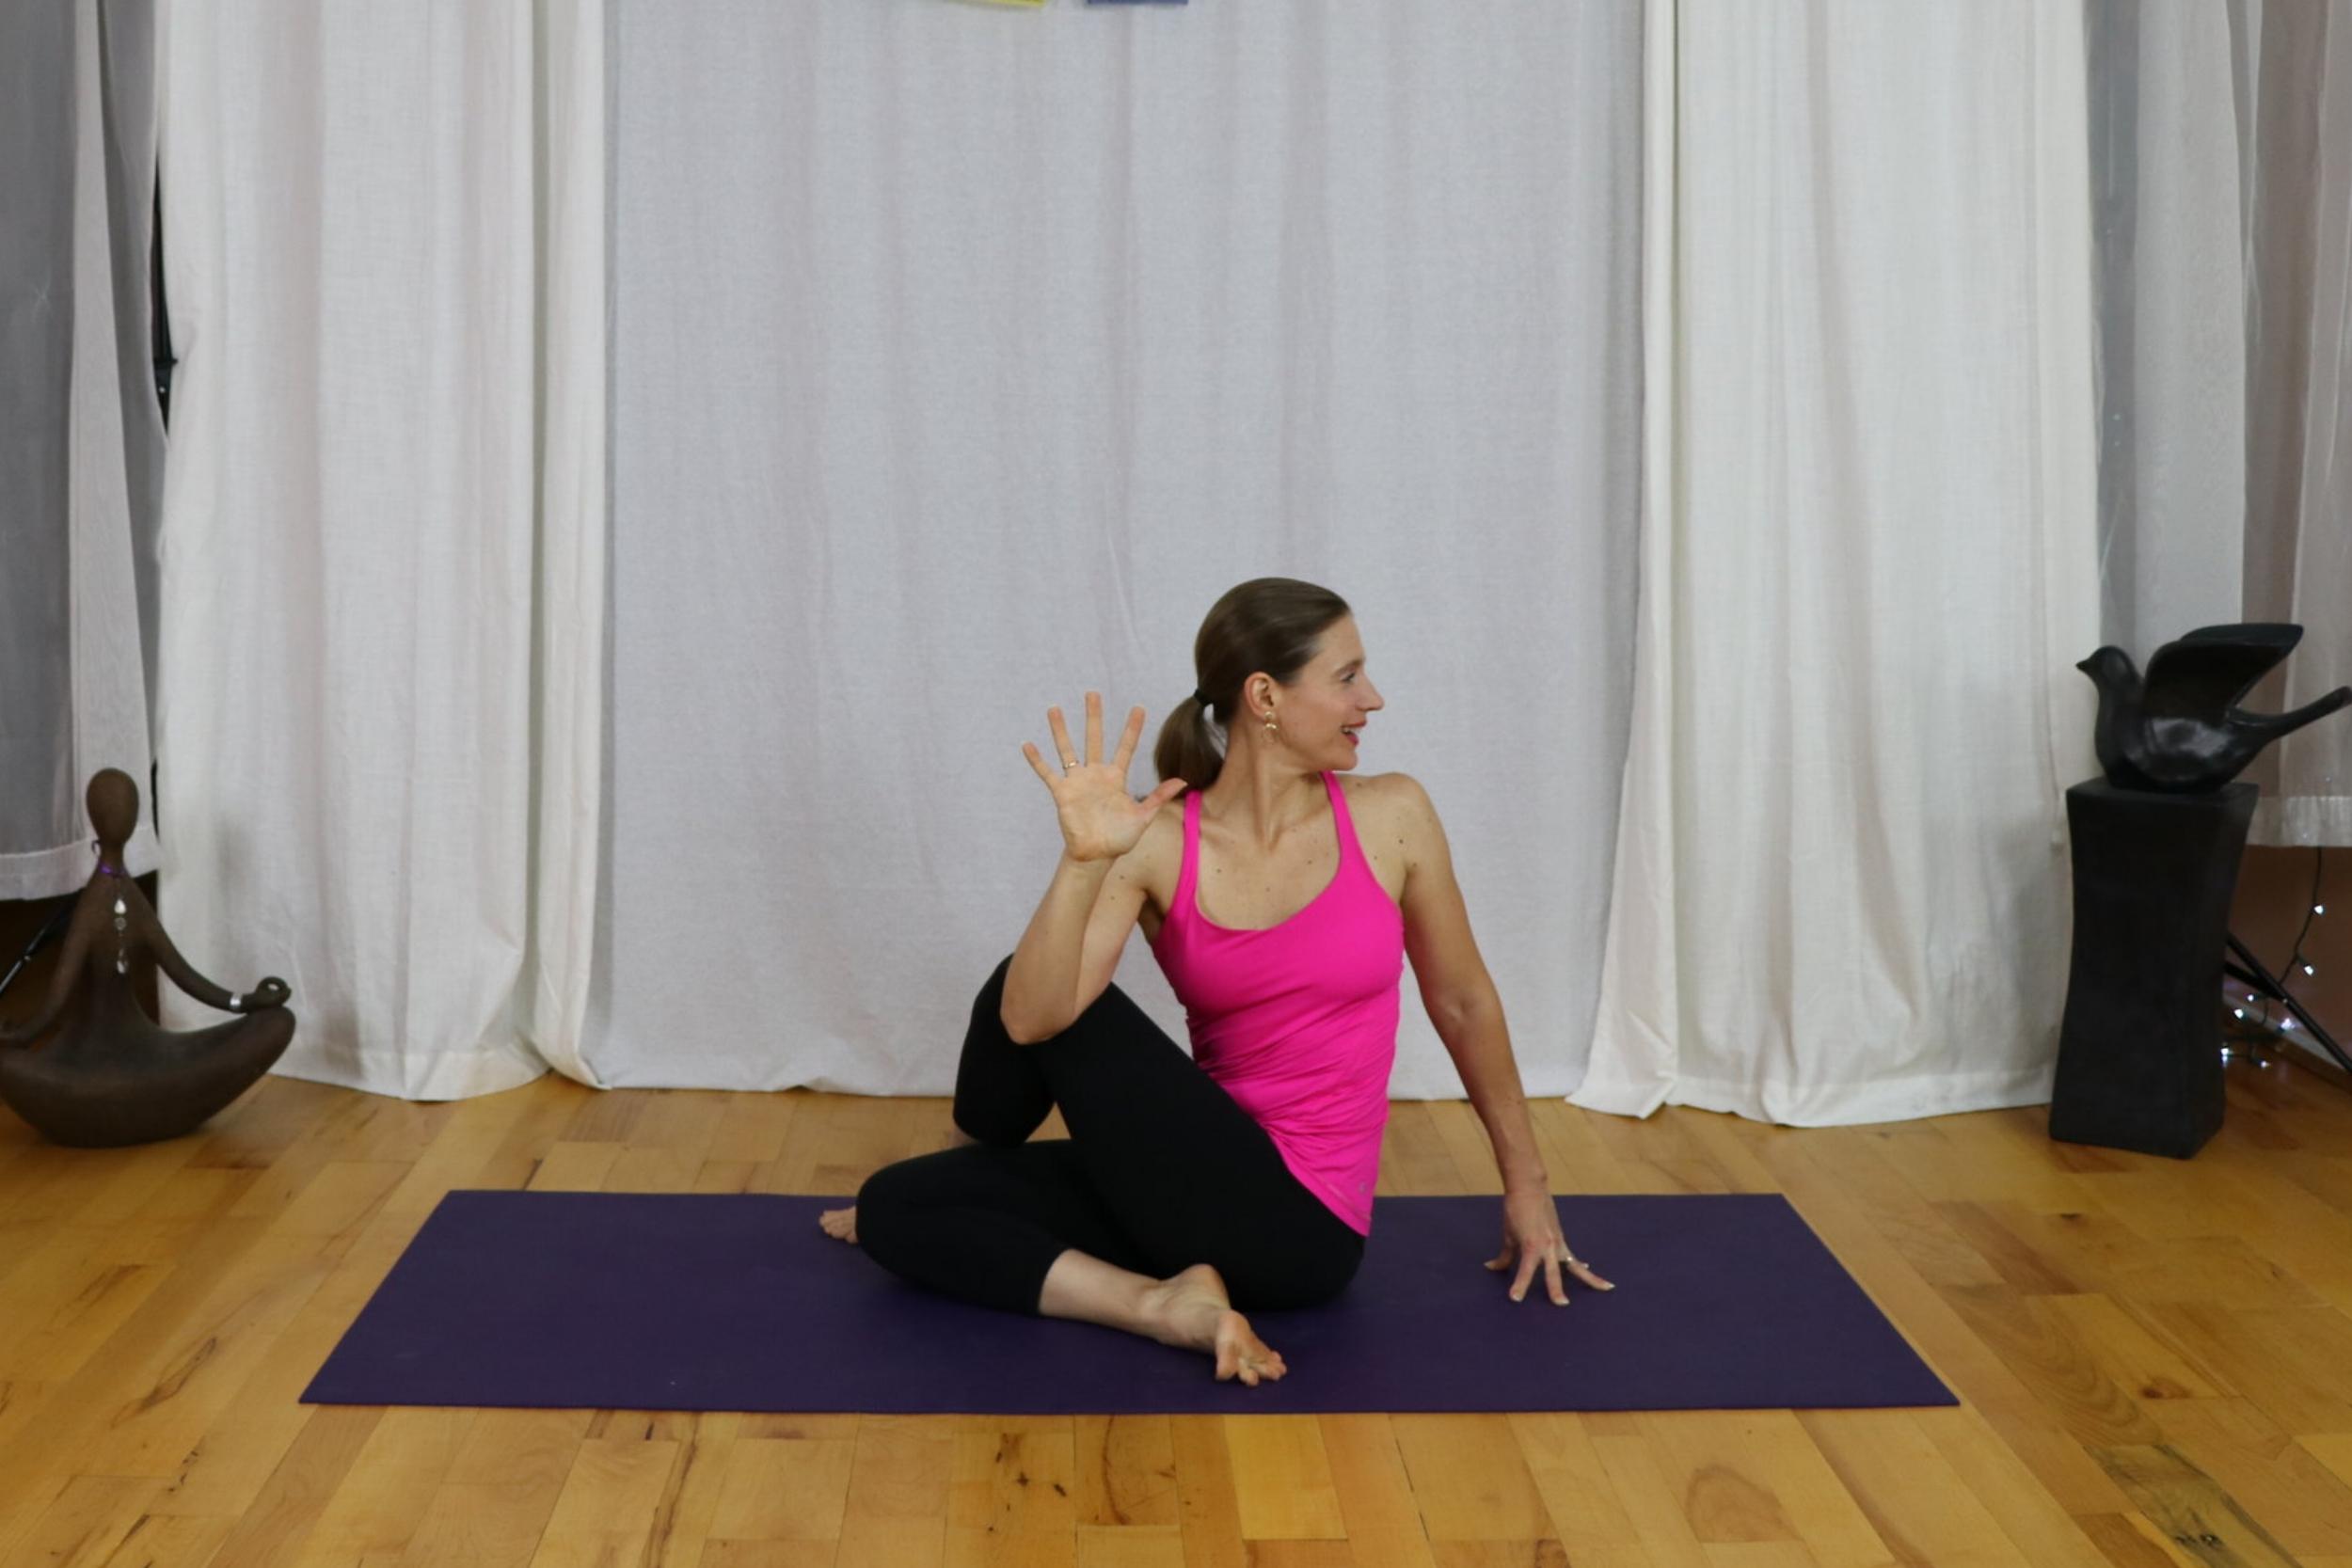 yoga for tight hips half twist pose/ardha matsyendrasana yoga with irena miller www.irenamiler.com